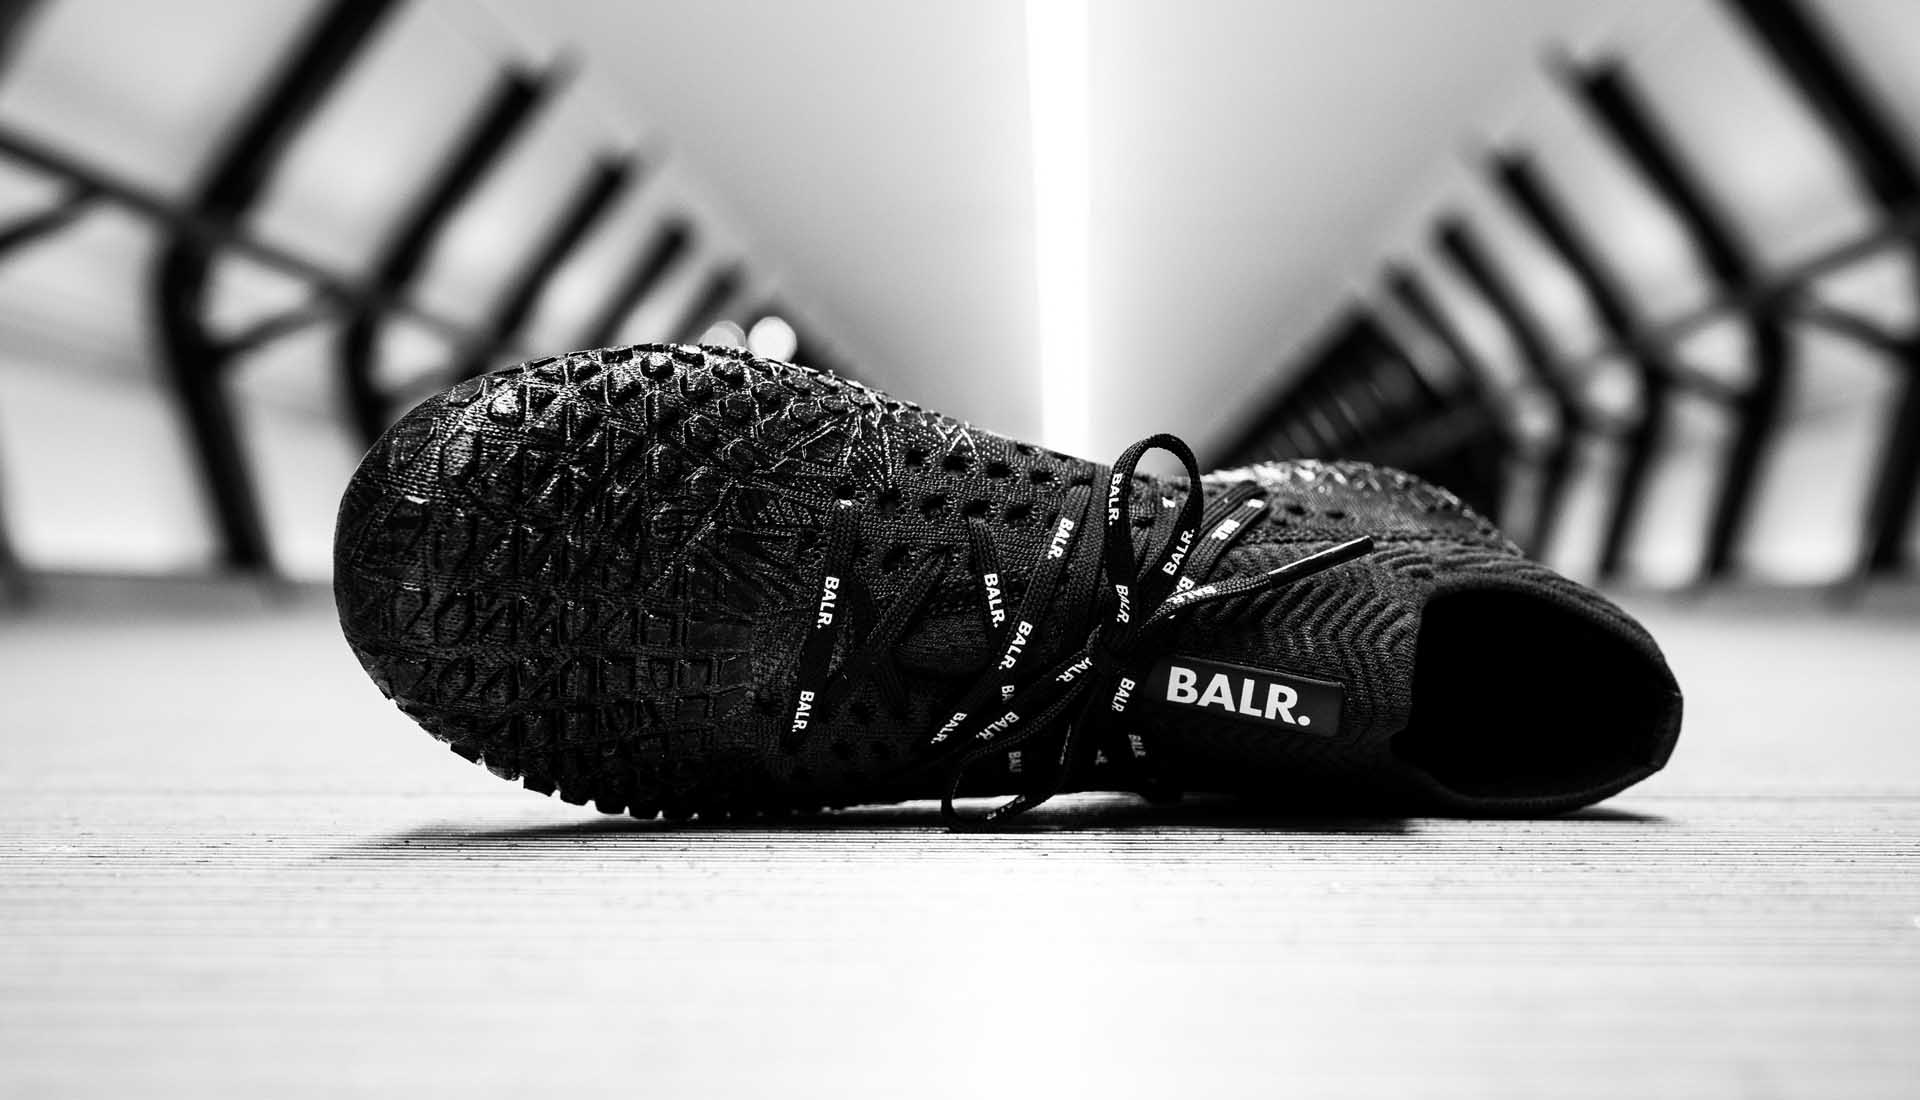 Giày đá bóng Puma Future 4.1 Netfit 'BALR'